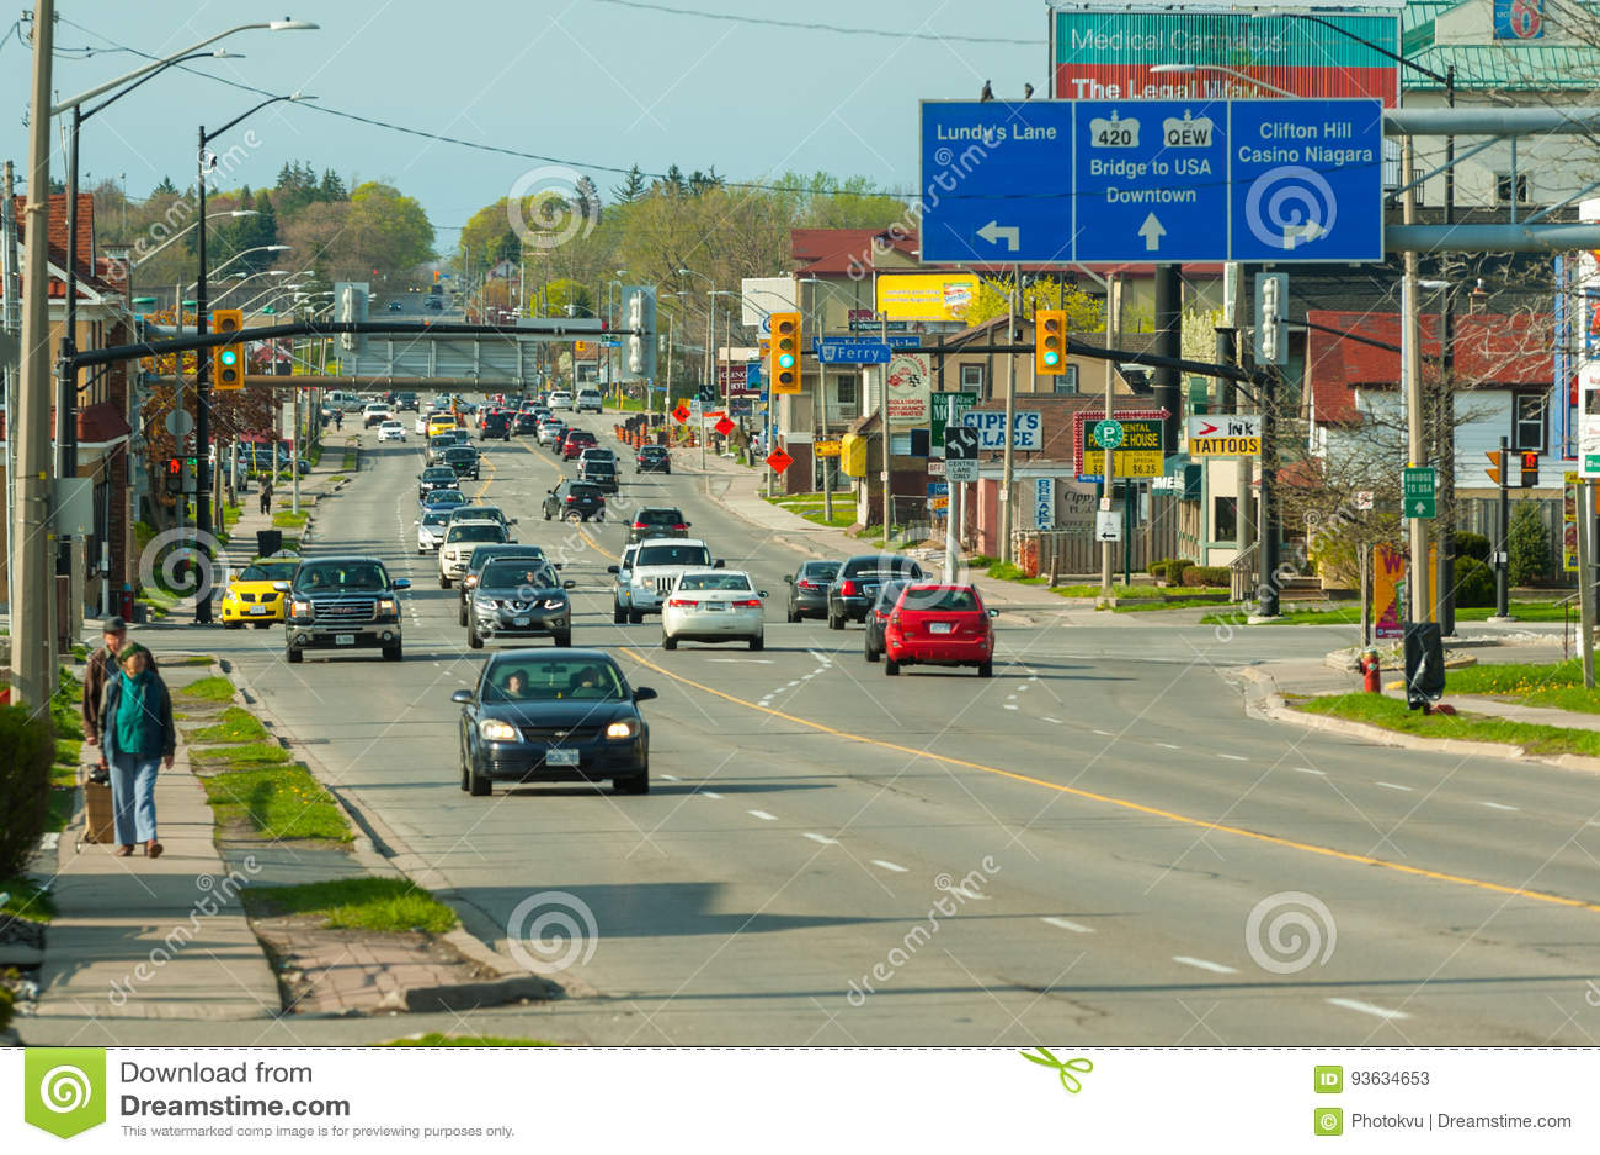 Street View In Niagara Falls Town Canada Editorial Stock Photo